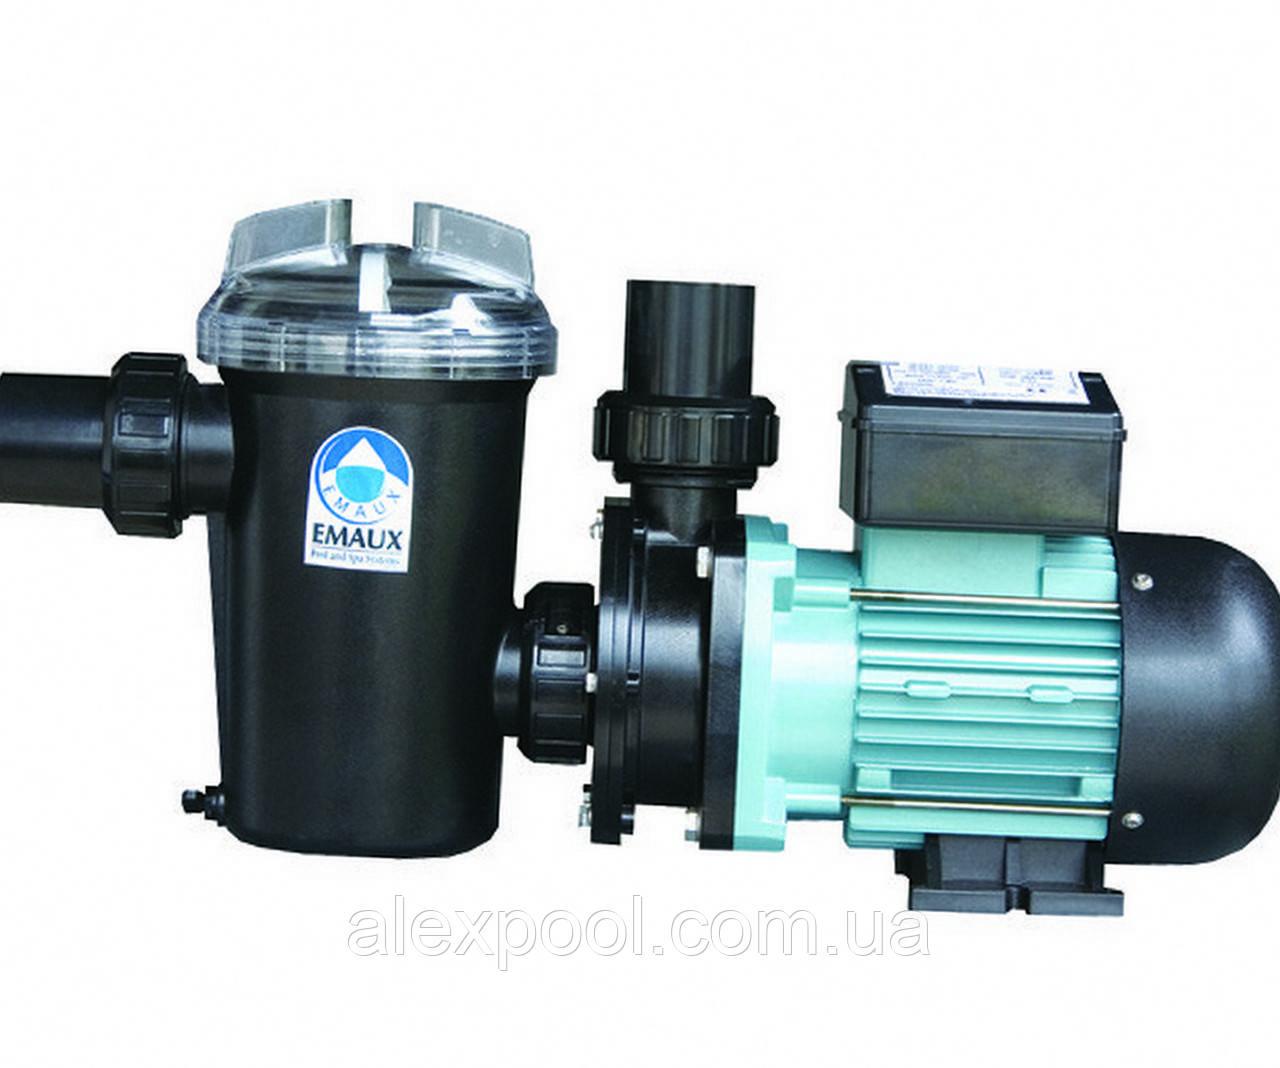 Emaux SD033 Насос для басейнів (SD 033, 4 м. куб/год, 0,43 кВт, 0,33 HP, 220В )